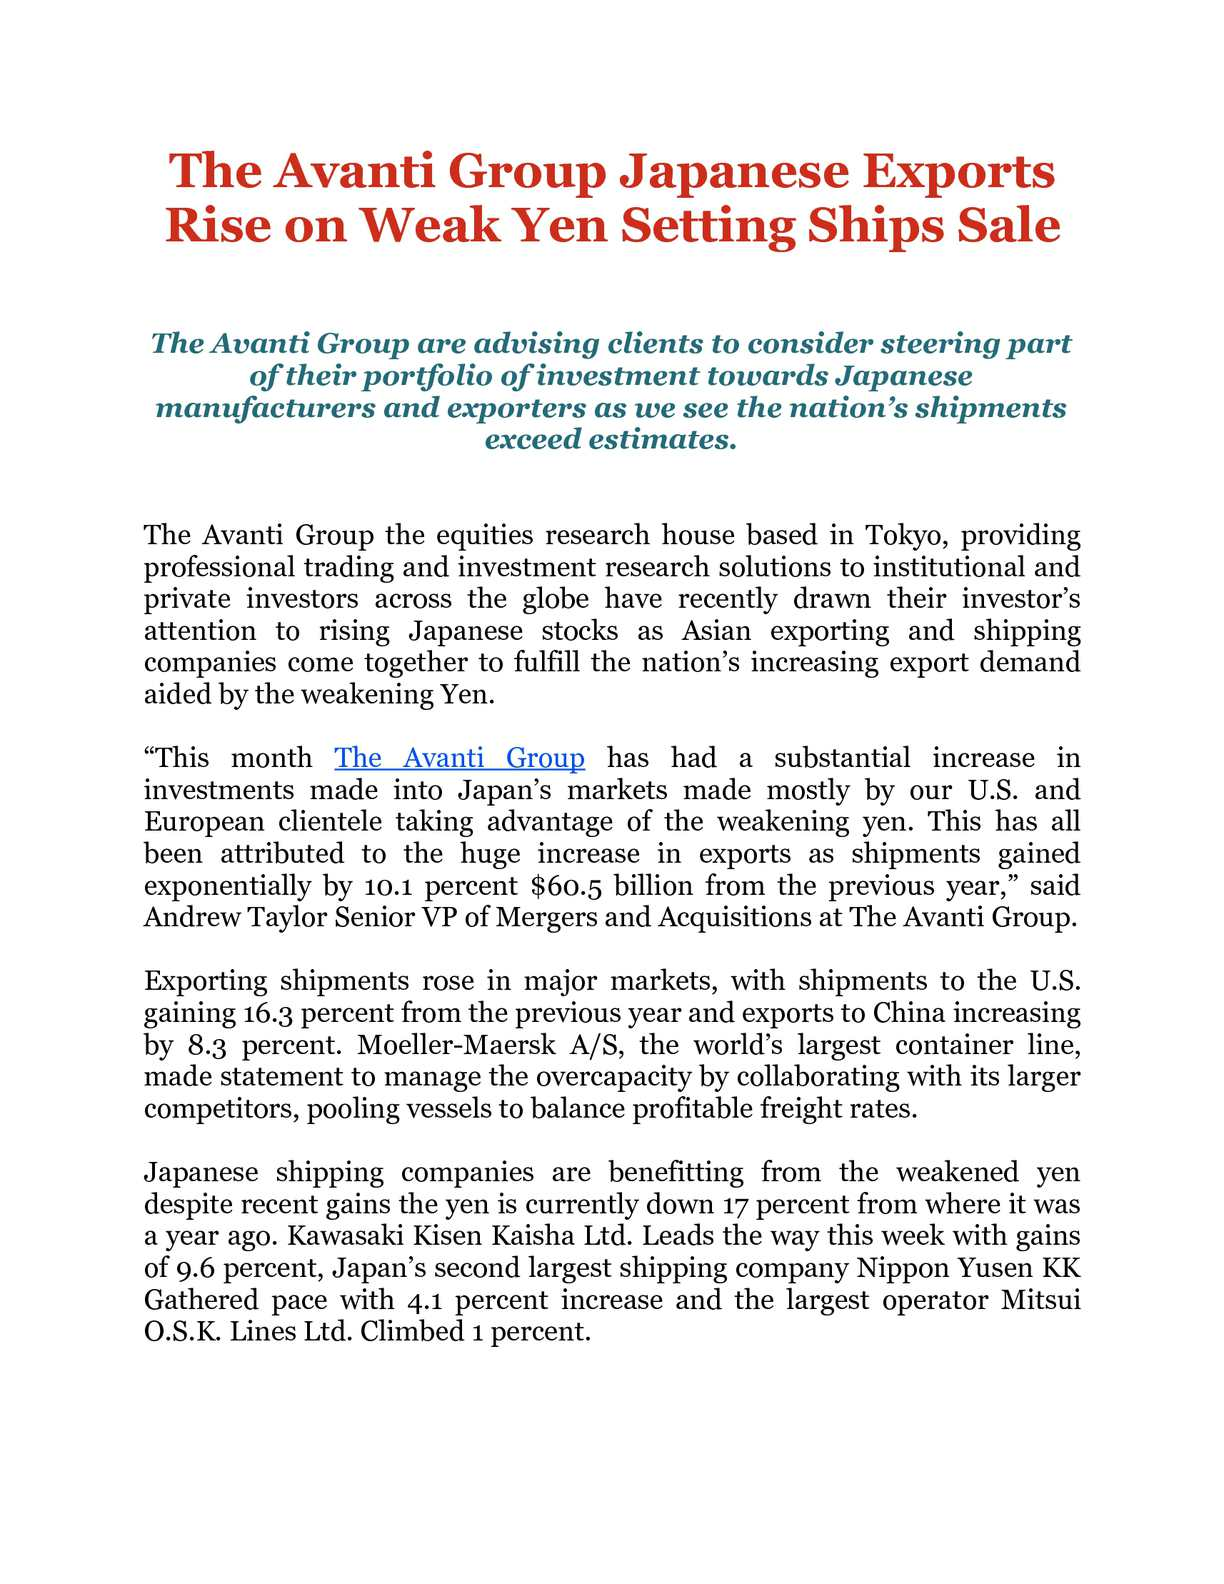 Calaméo - The Avanti Group Japanese Exports Rise on Weak Yen